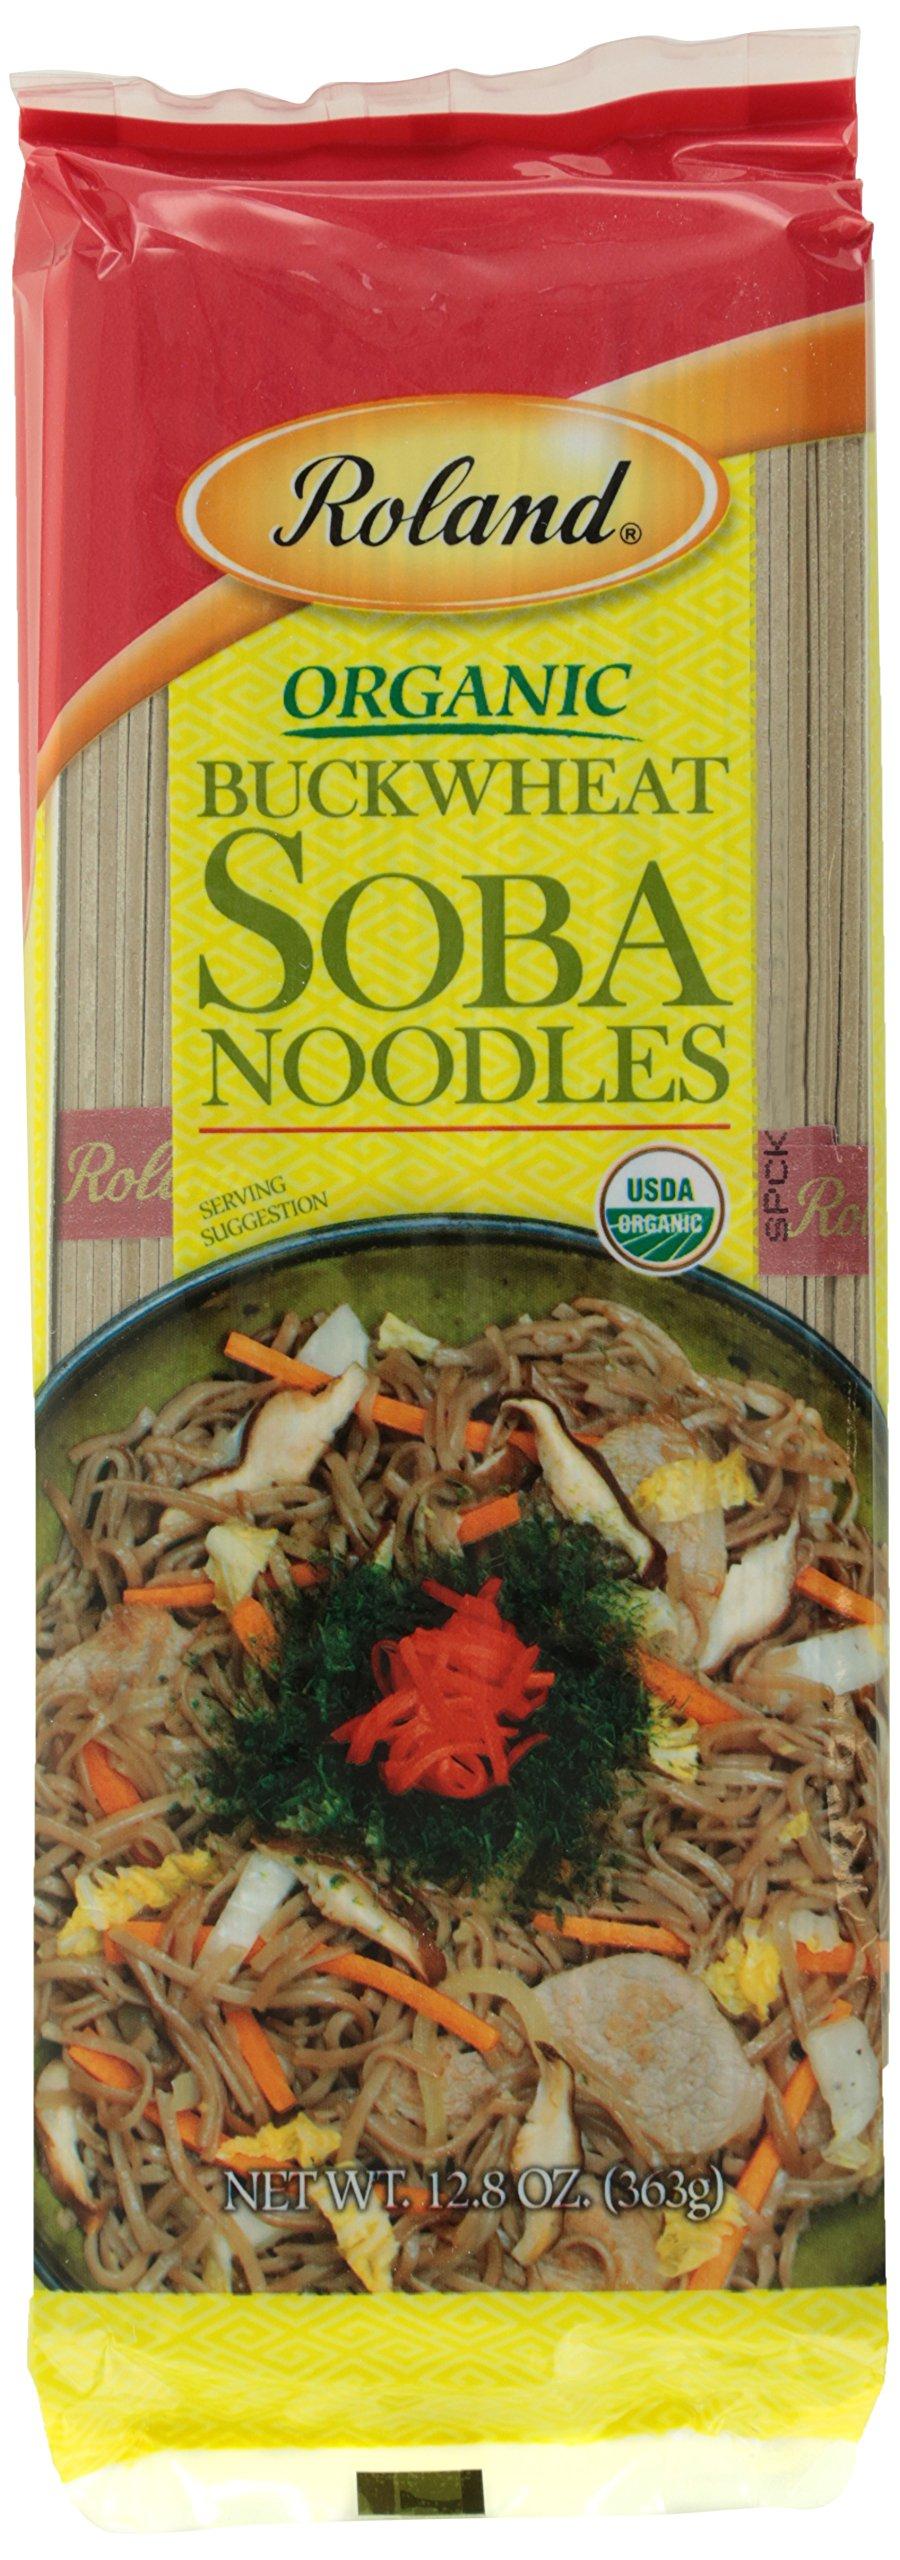 Roland Organic Buckwheat Soba Noodles